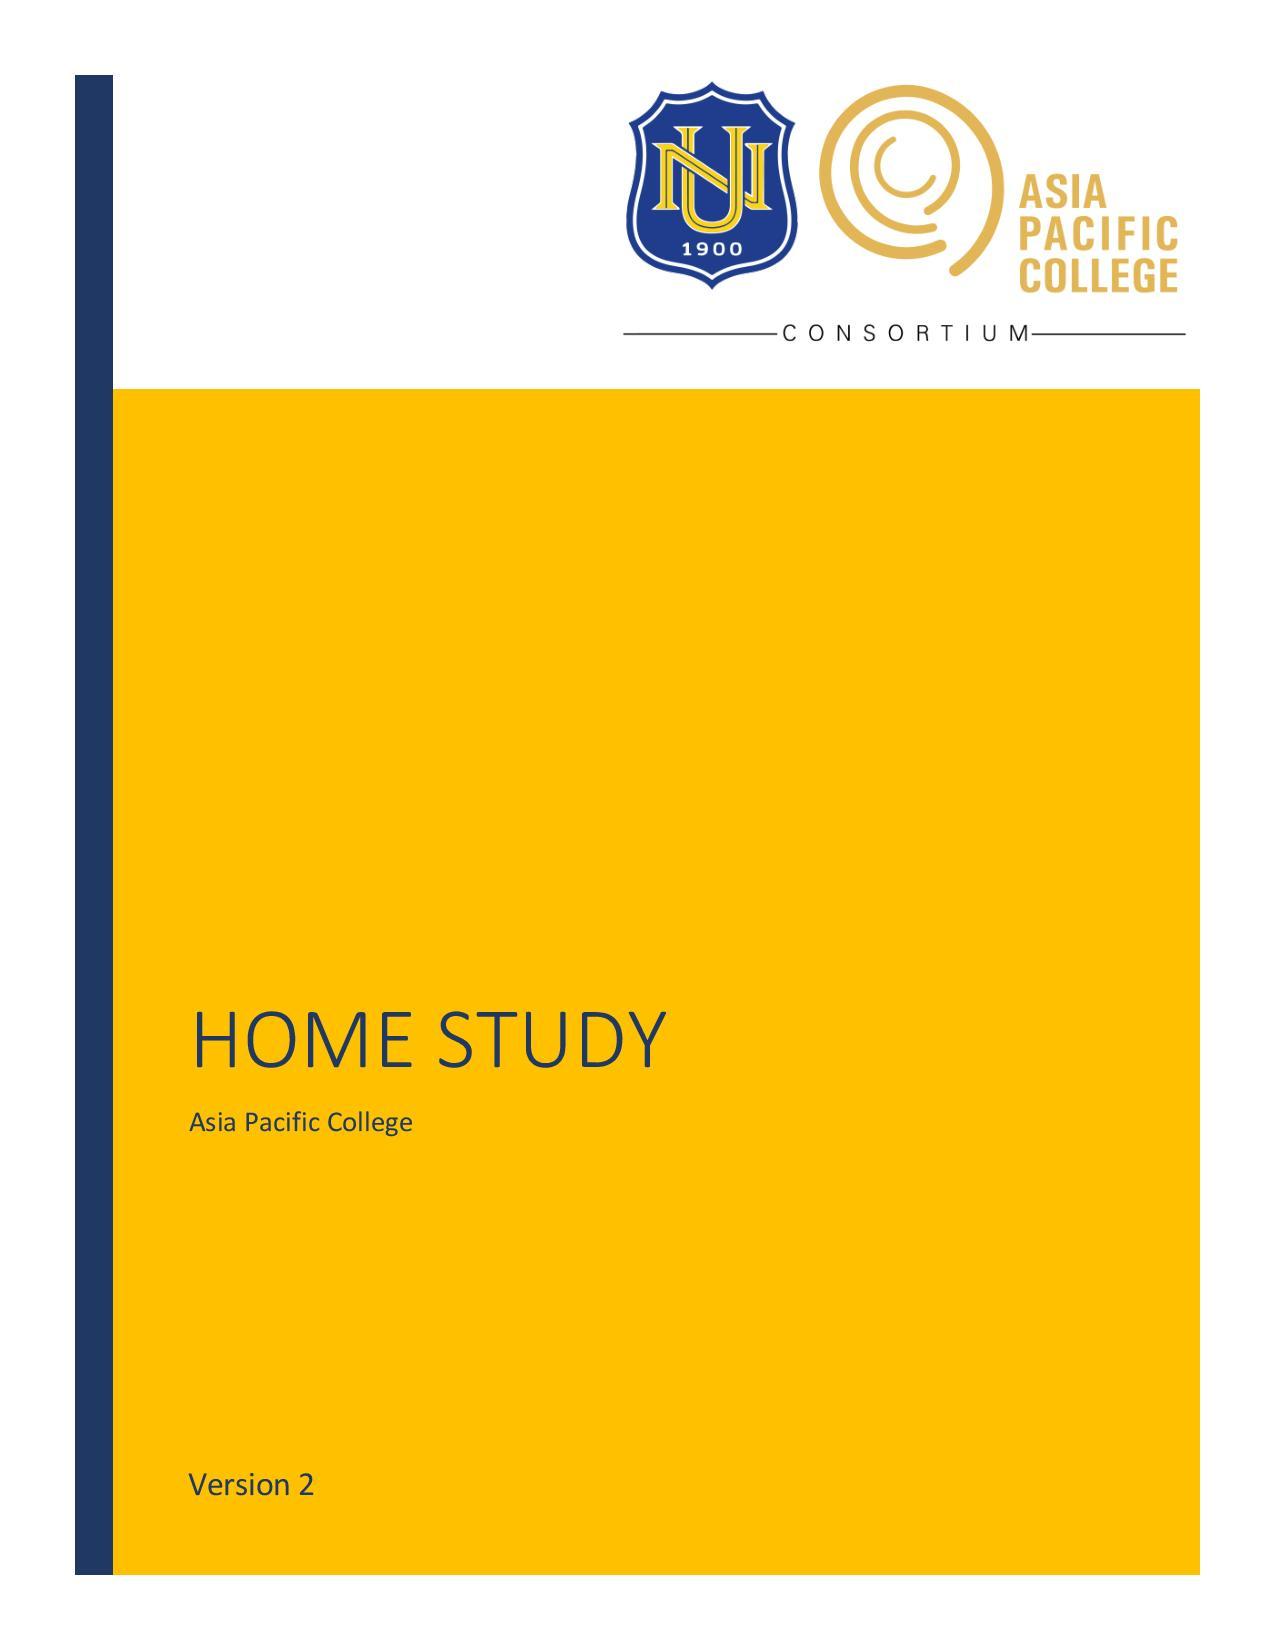 1. Home Study_1 May 2020 v2-page-001